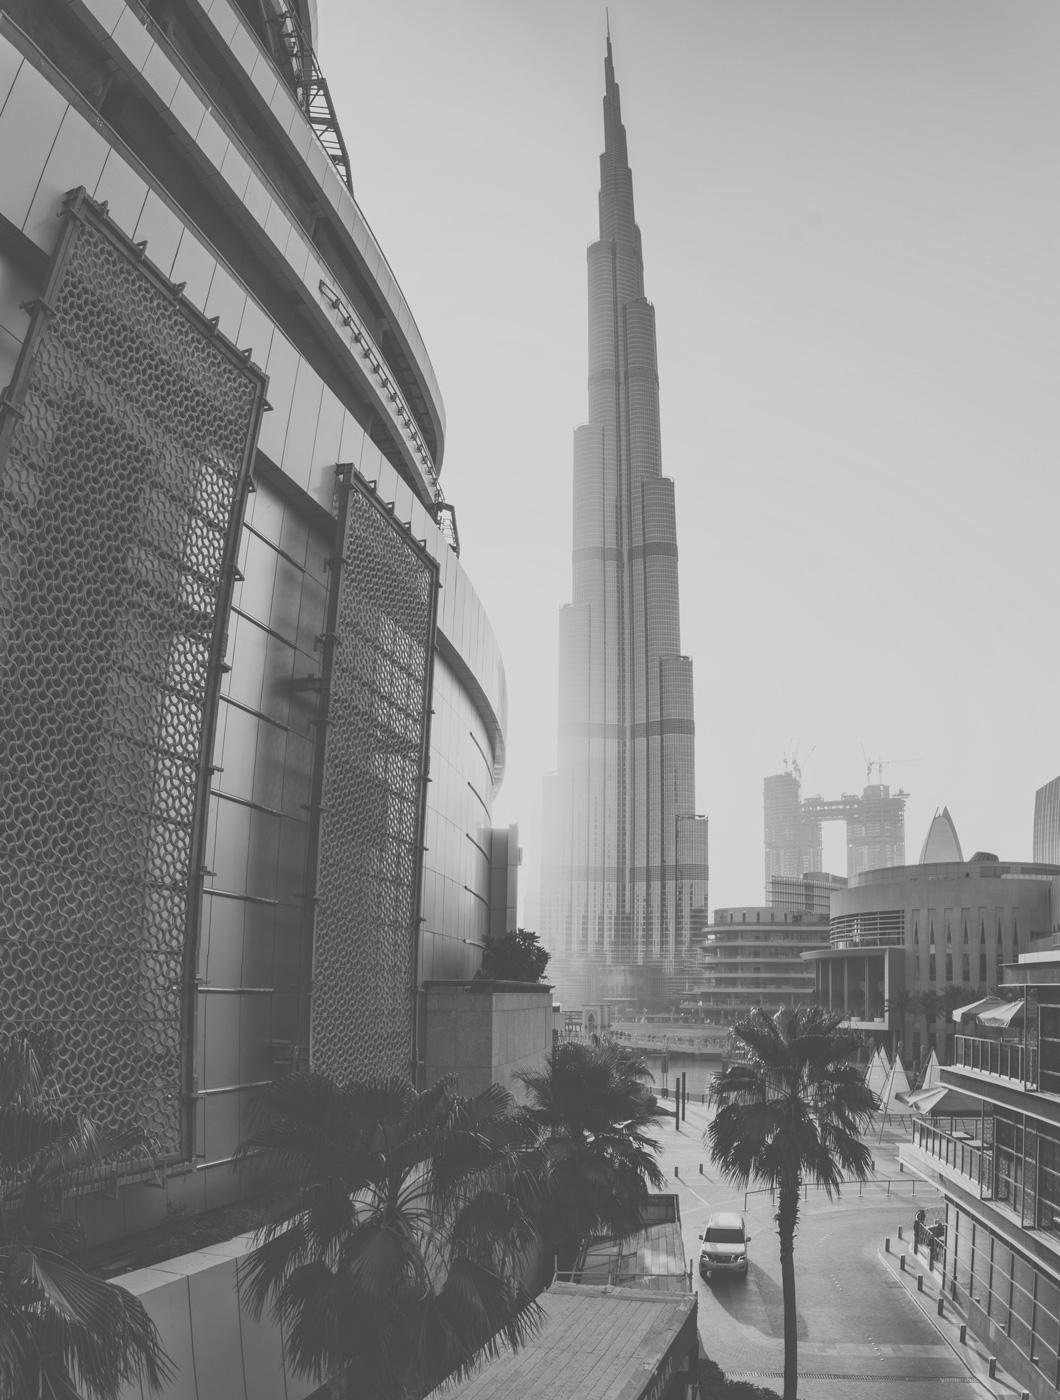 Stadtansicht mit Burj Khalifa in Dubai